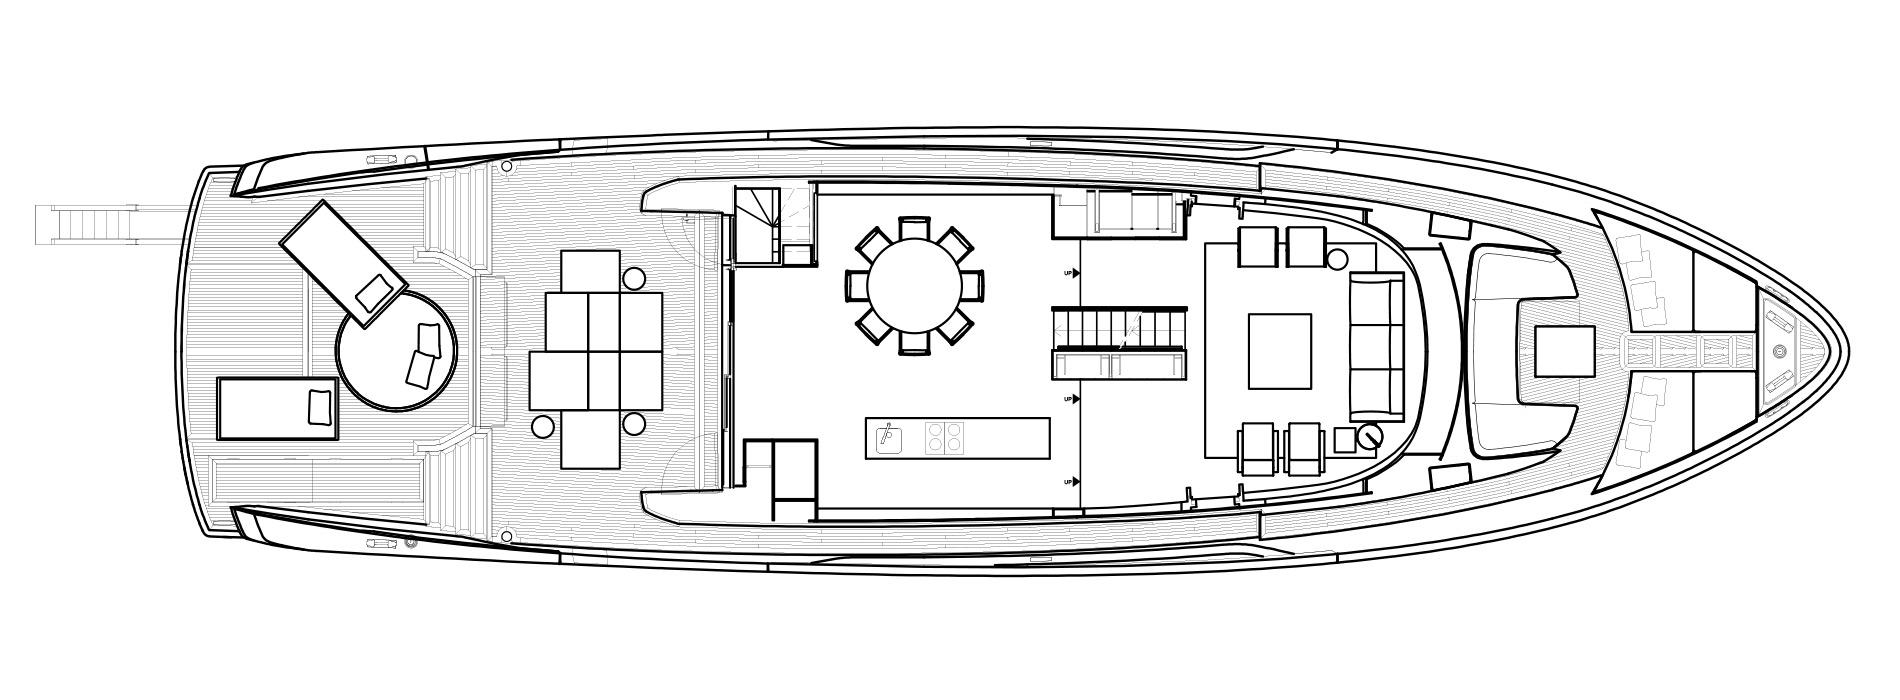 Sanlorenzo Yachts SX88 Main deck Version Lissoni